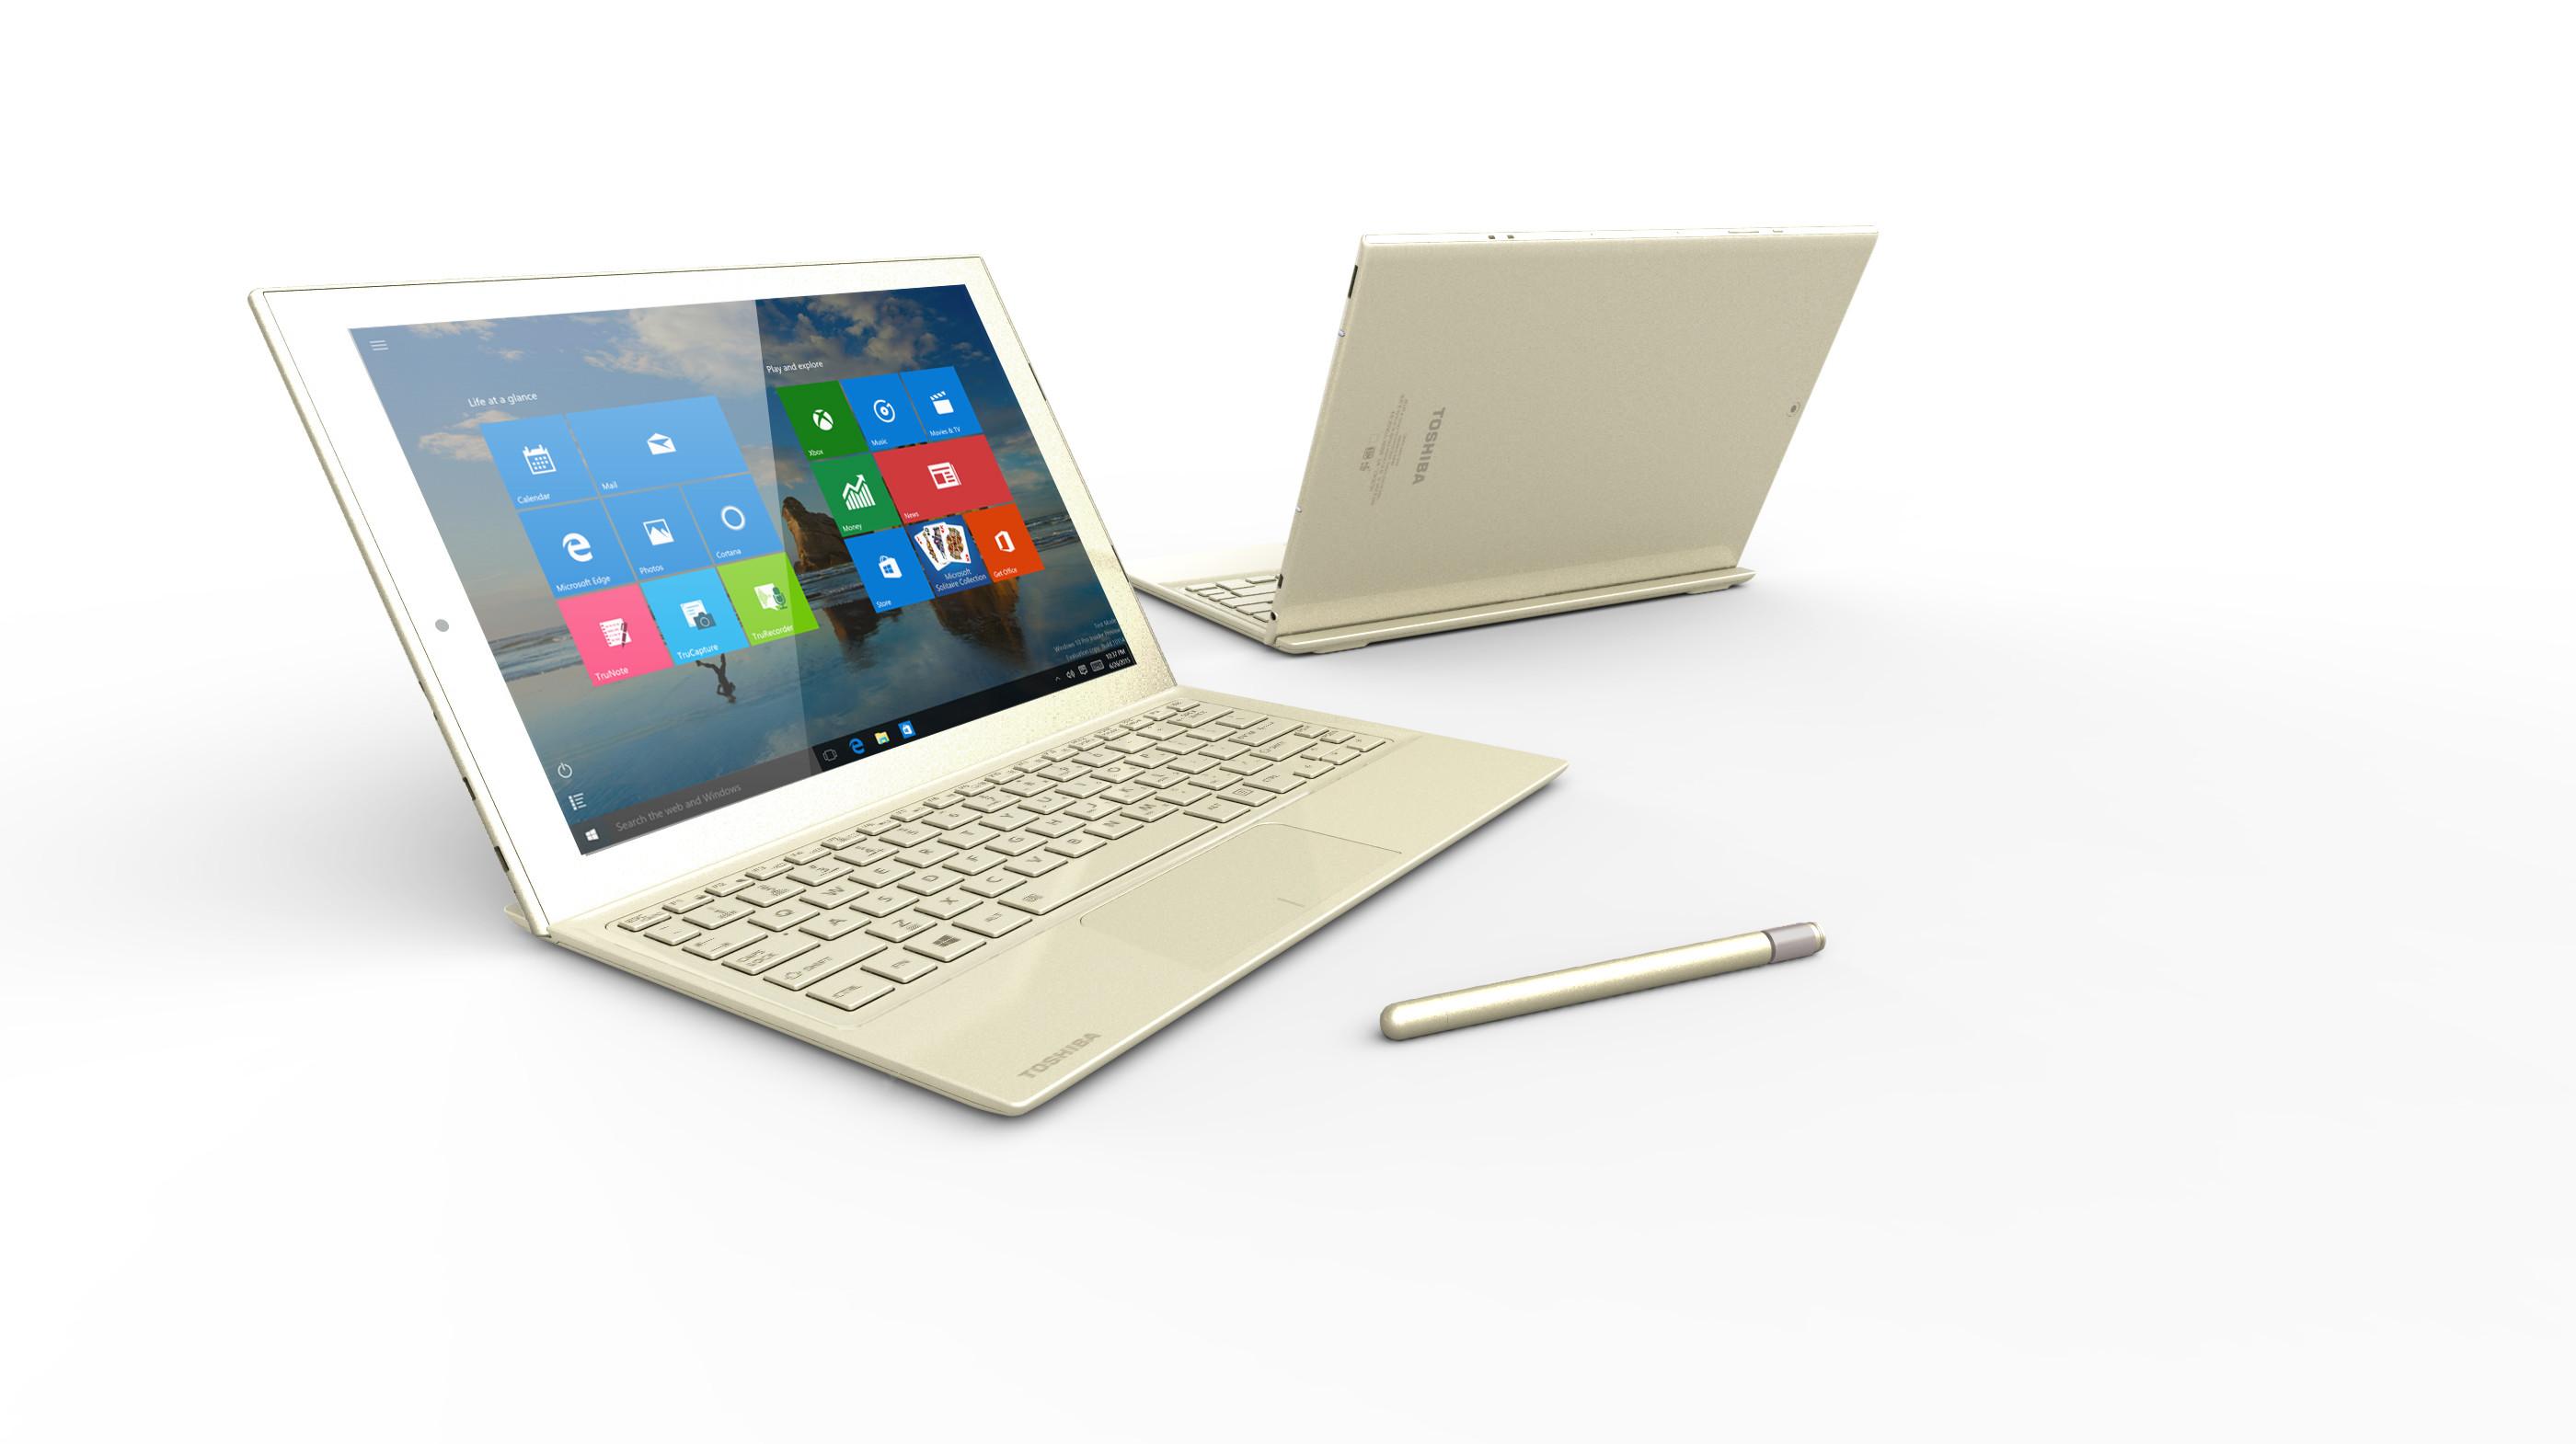 Microsoft reveals Toshiba dynaPad, a stunningly thin 12-inch Windows